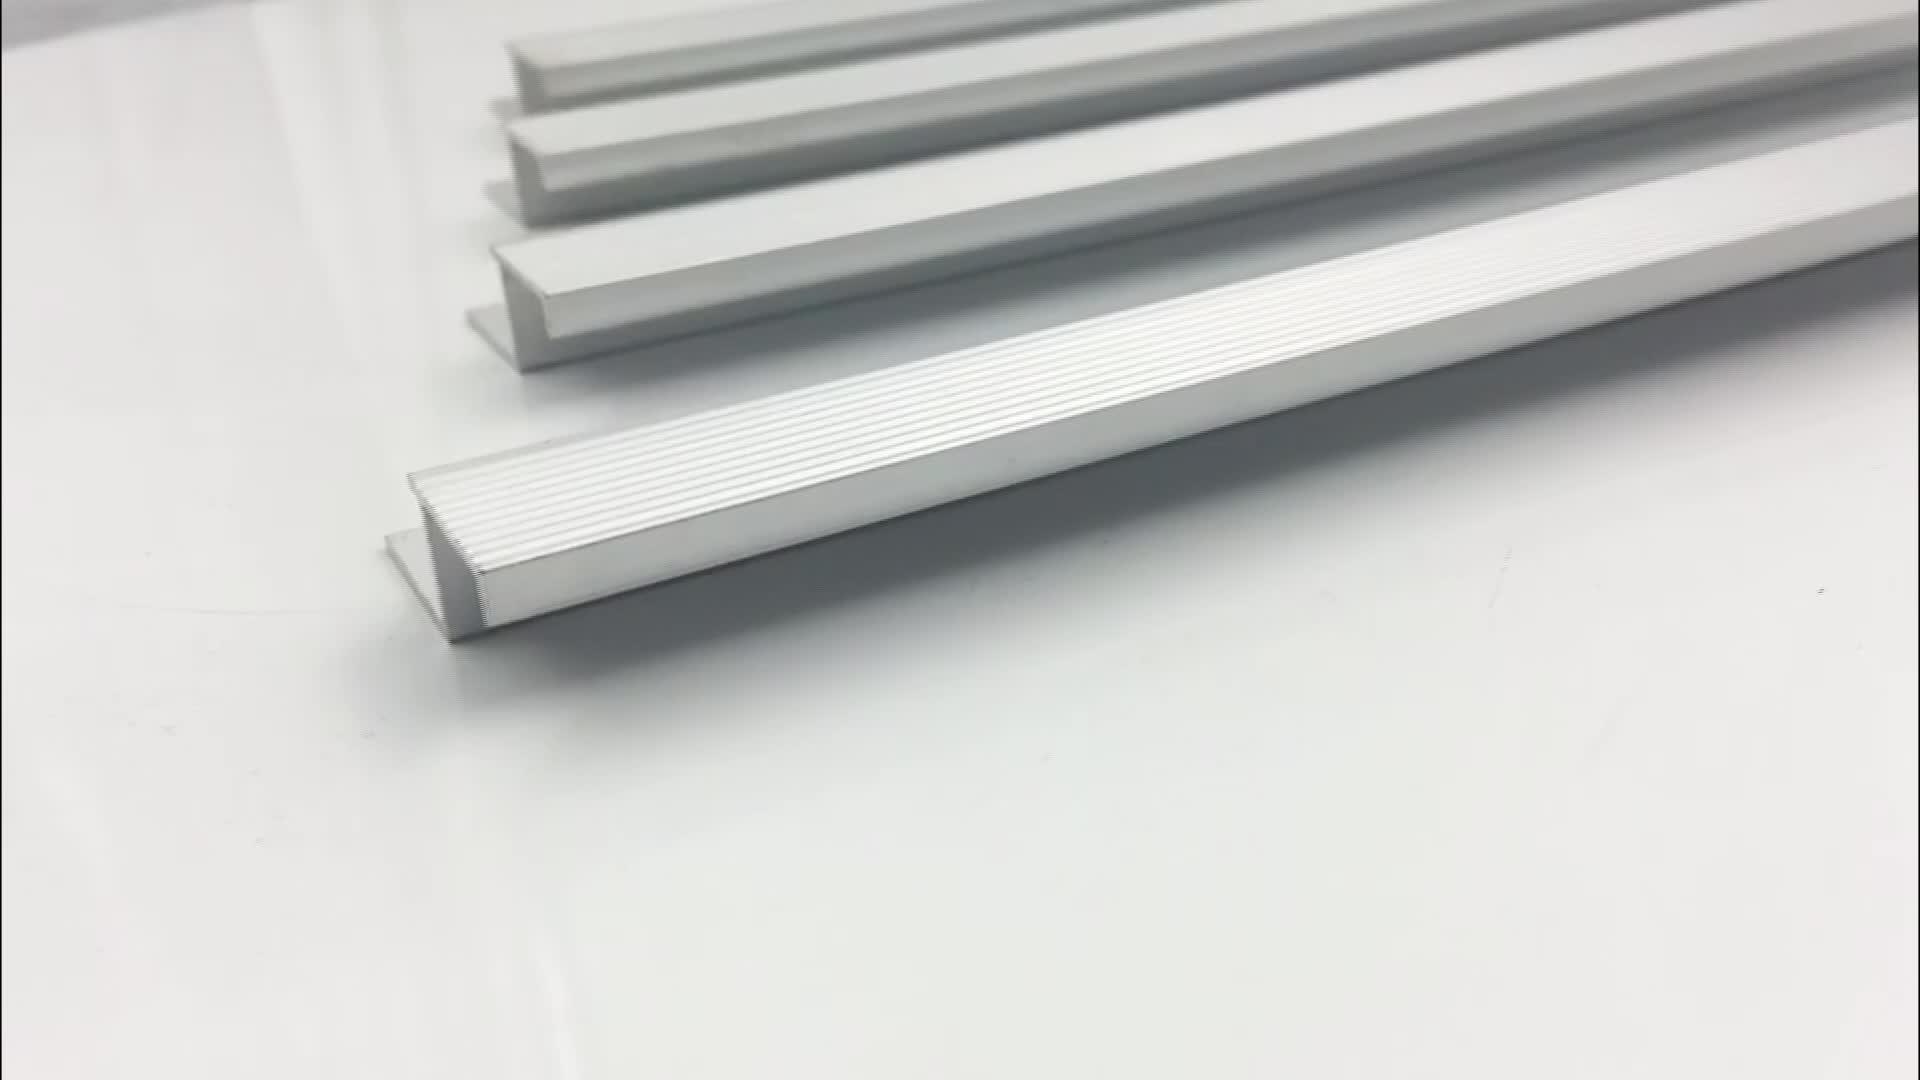 aluminum anodized matt silver profile ceramic tile stair nosing